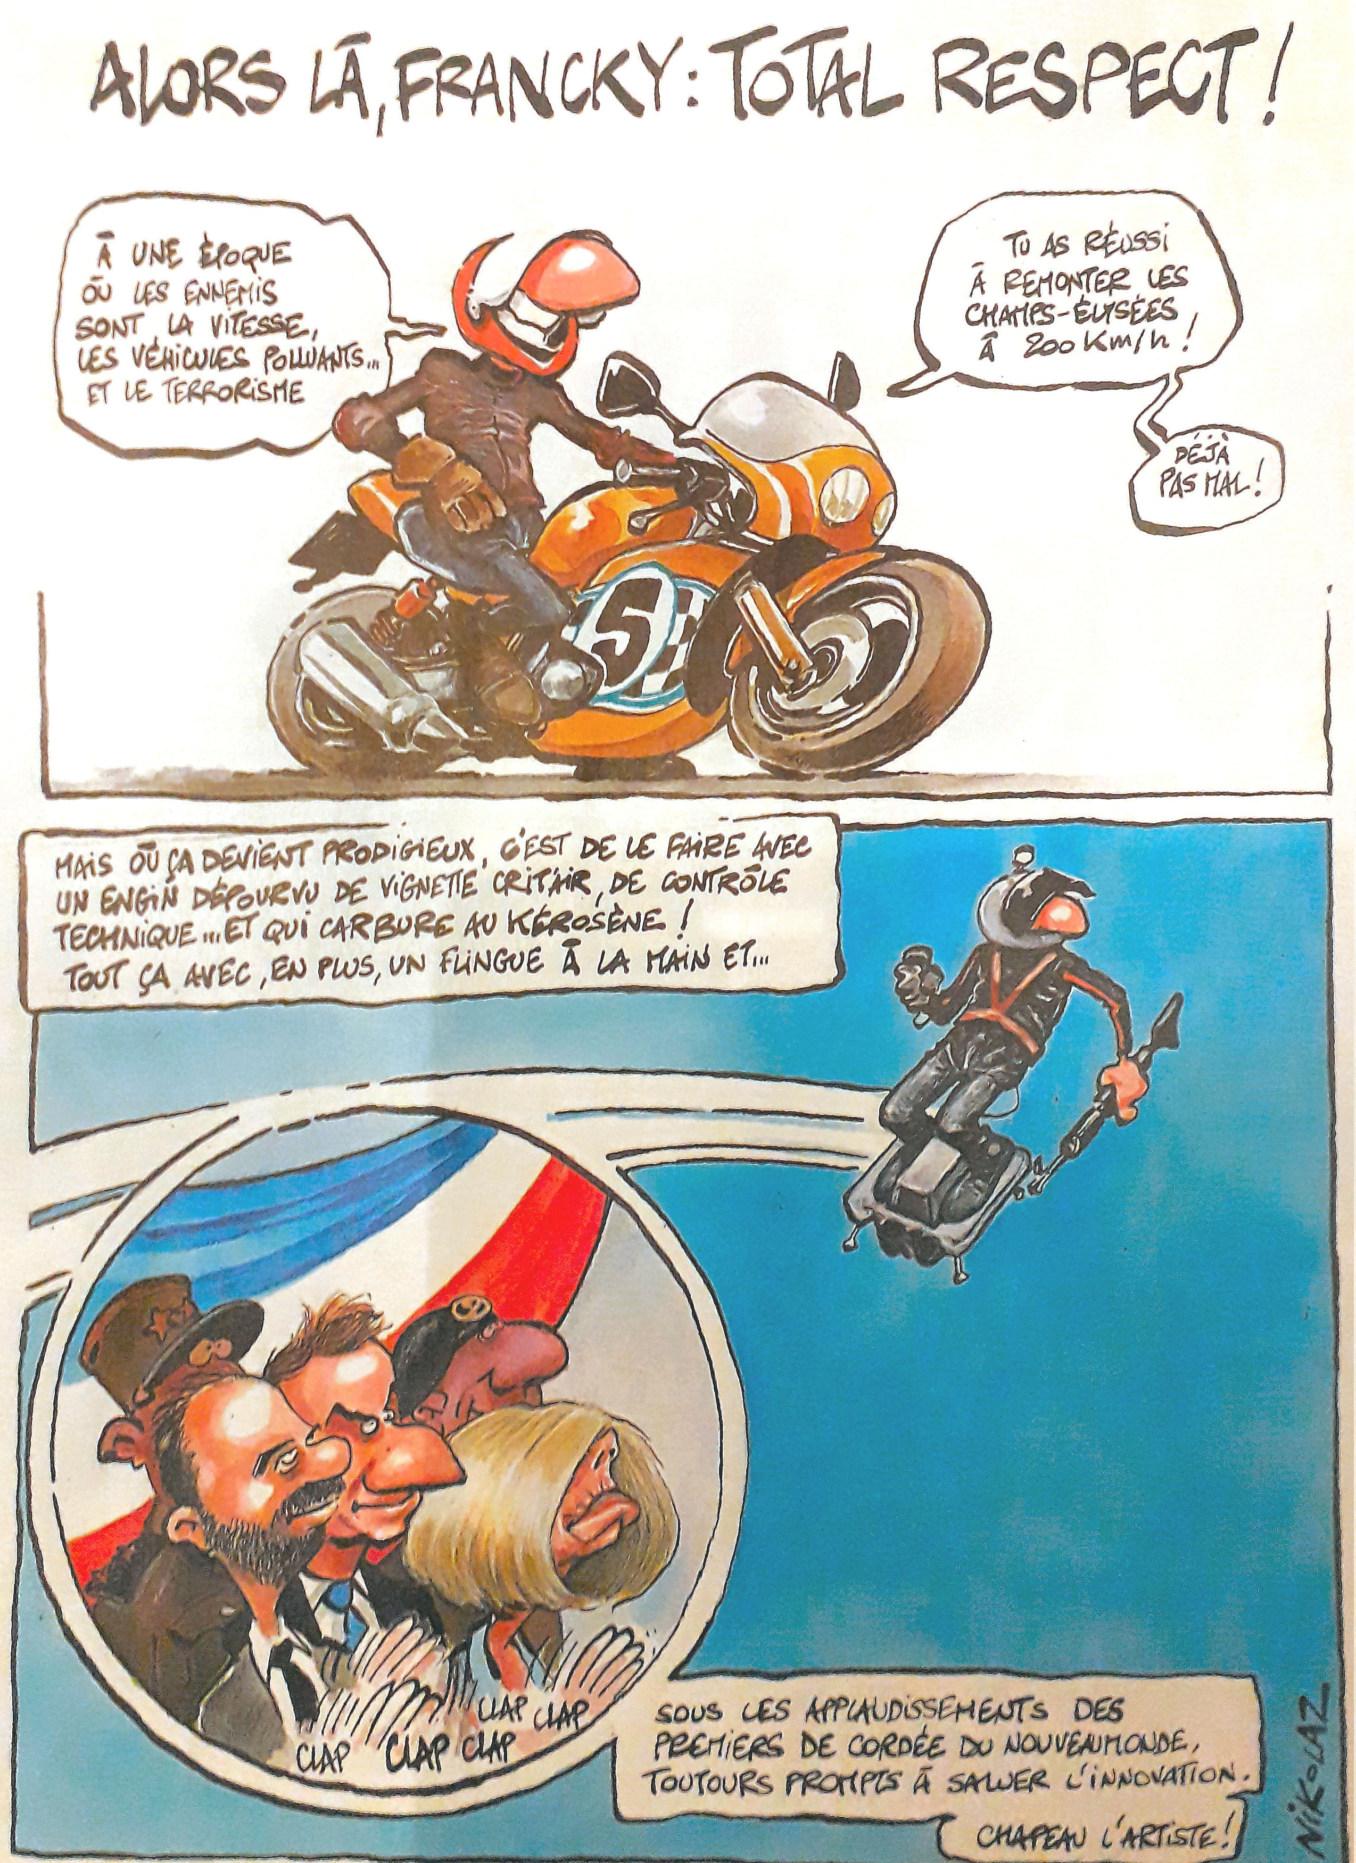 Humour en image du Forum Passion-Harley  ... - Page 11 Zapata13